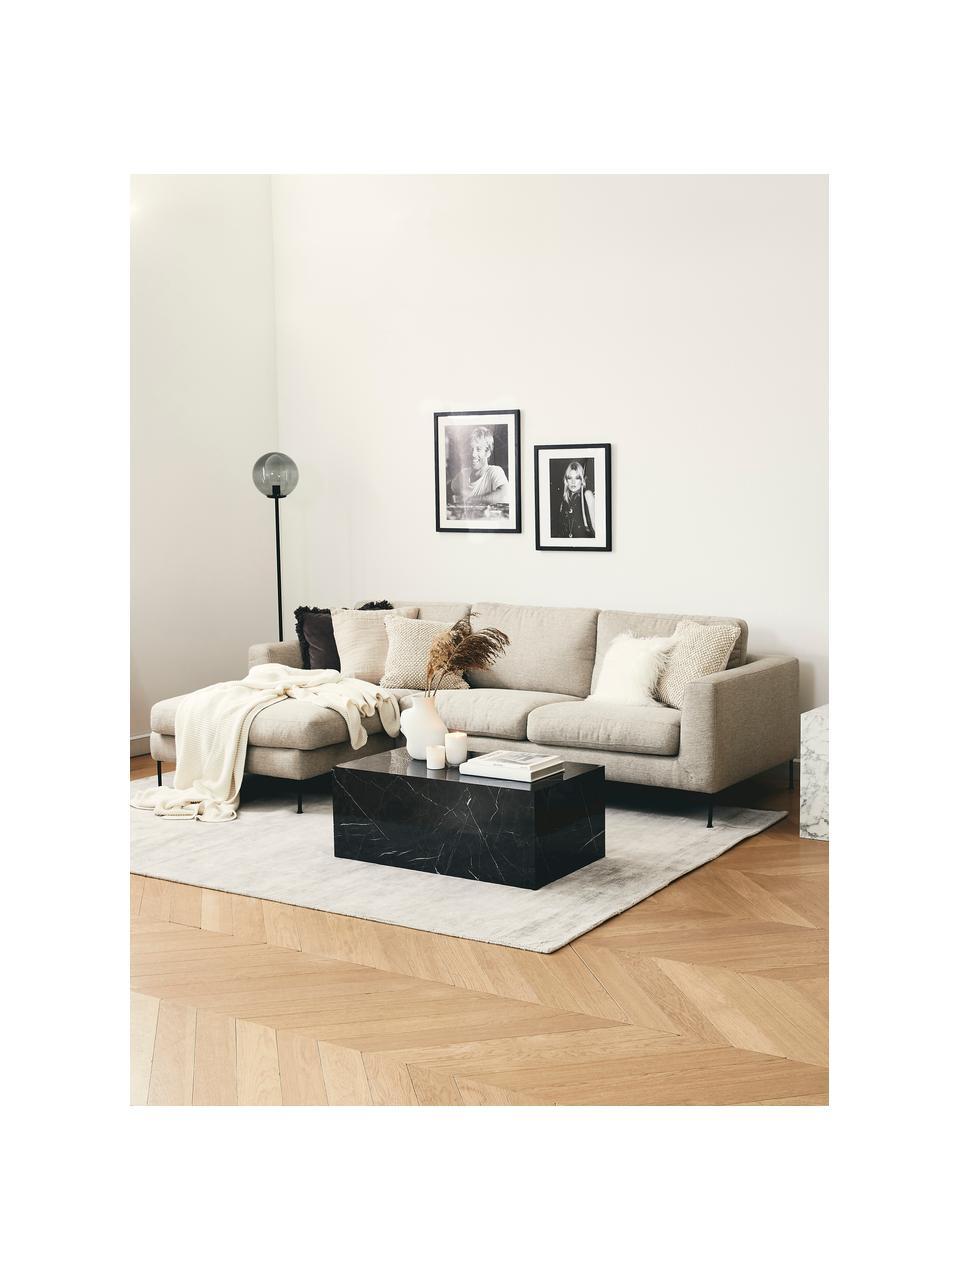 Canapé d'angle 4places beige Cucita, Tissu beige